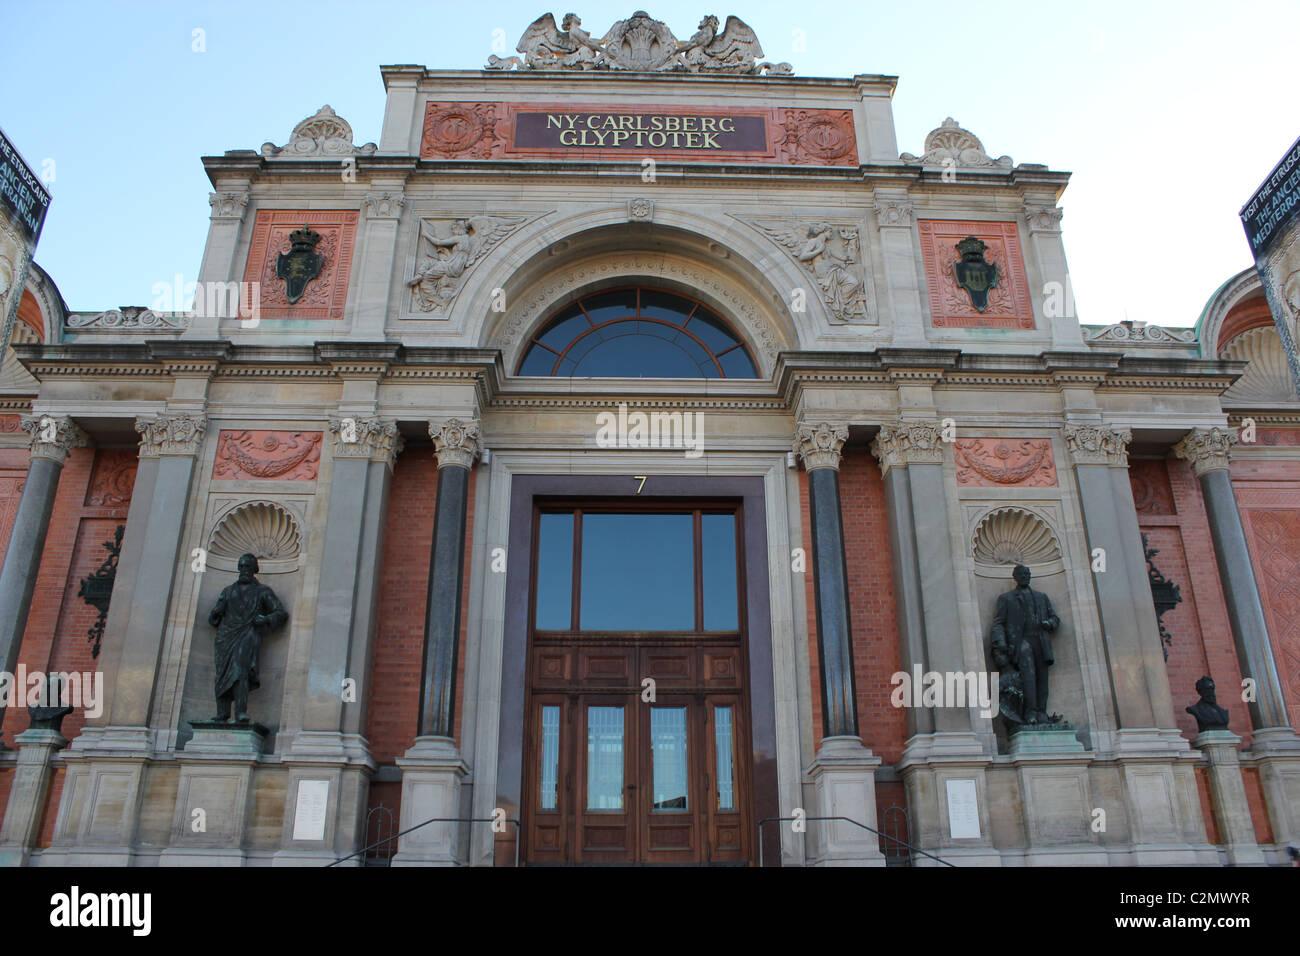 Ny Carlsberg Glyptotek museum in Copenhagen. - Stock Image